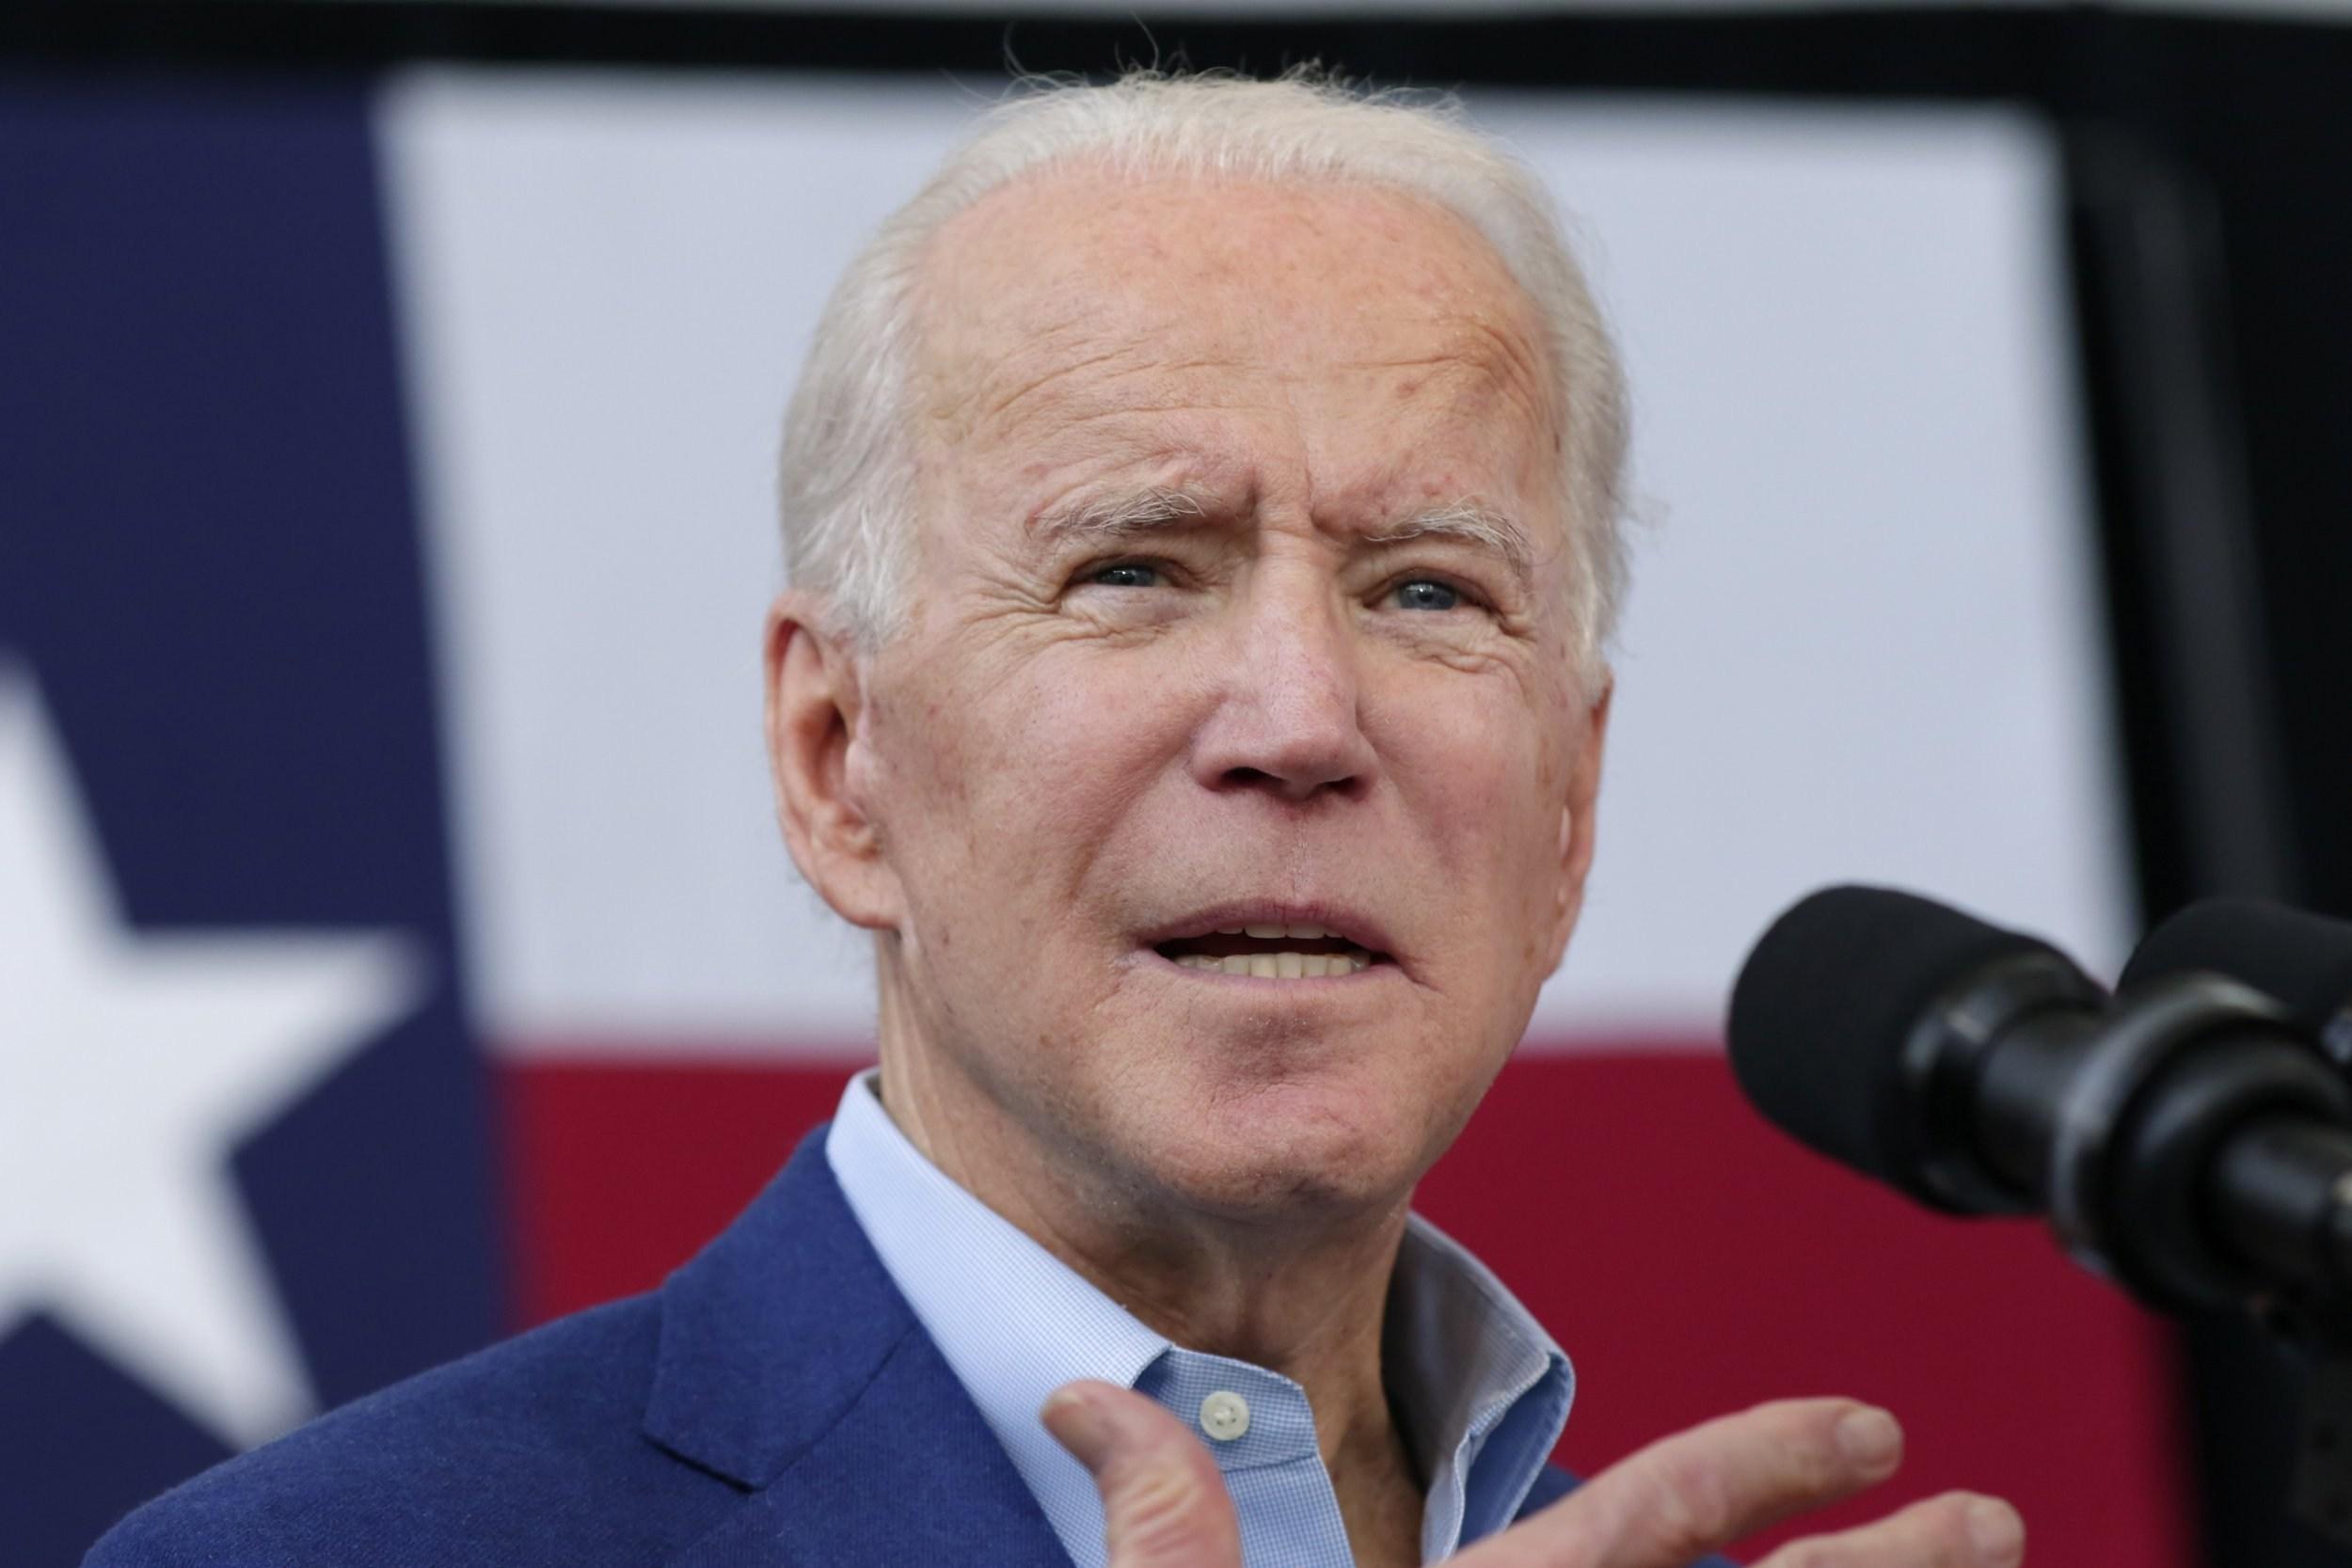 US presidential hopeful Joe Biden denies pinning ex-staffer to wall and sexually assaulting her